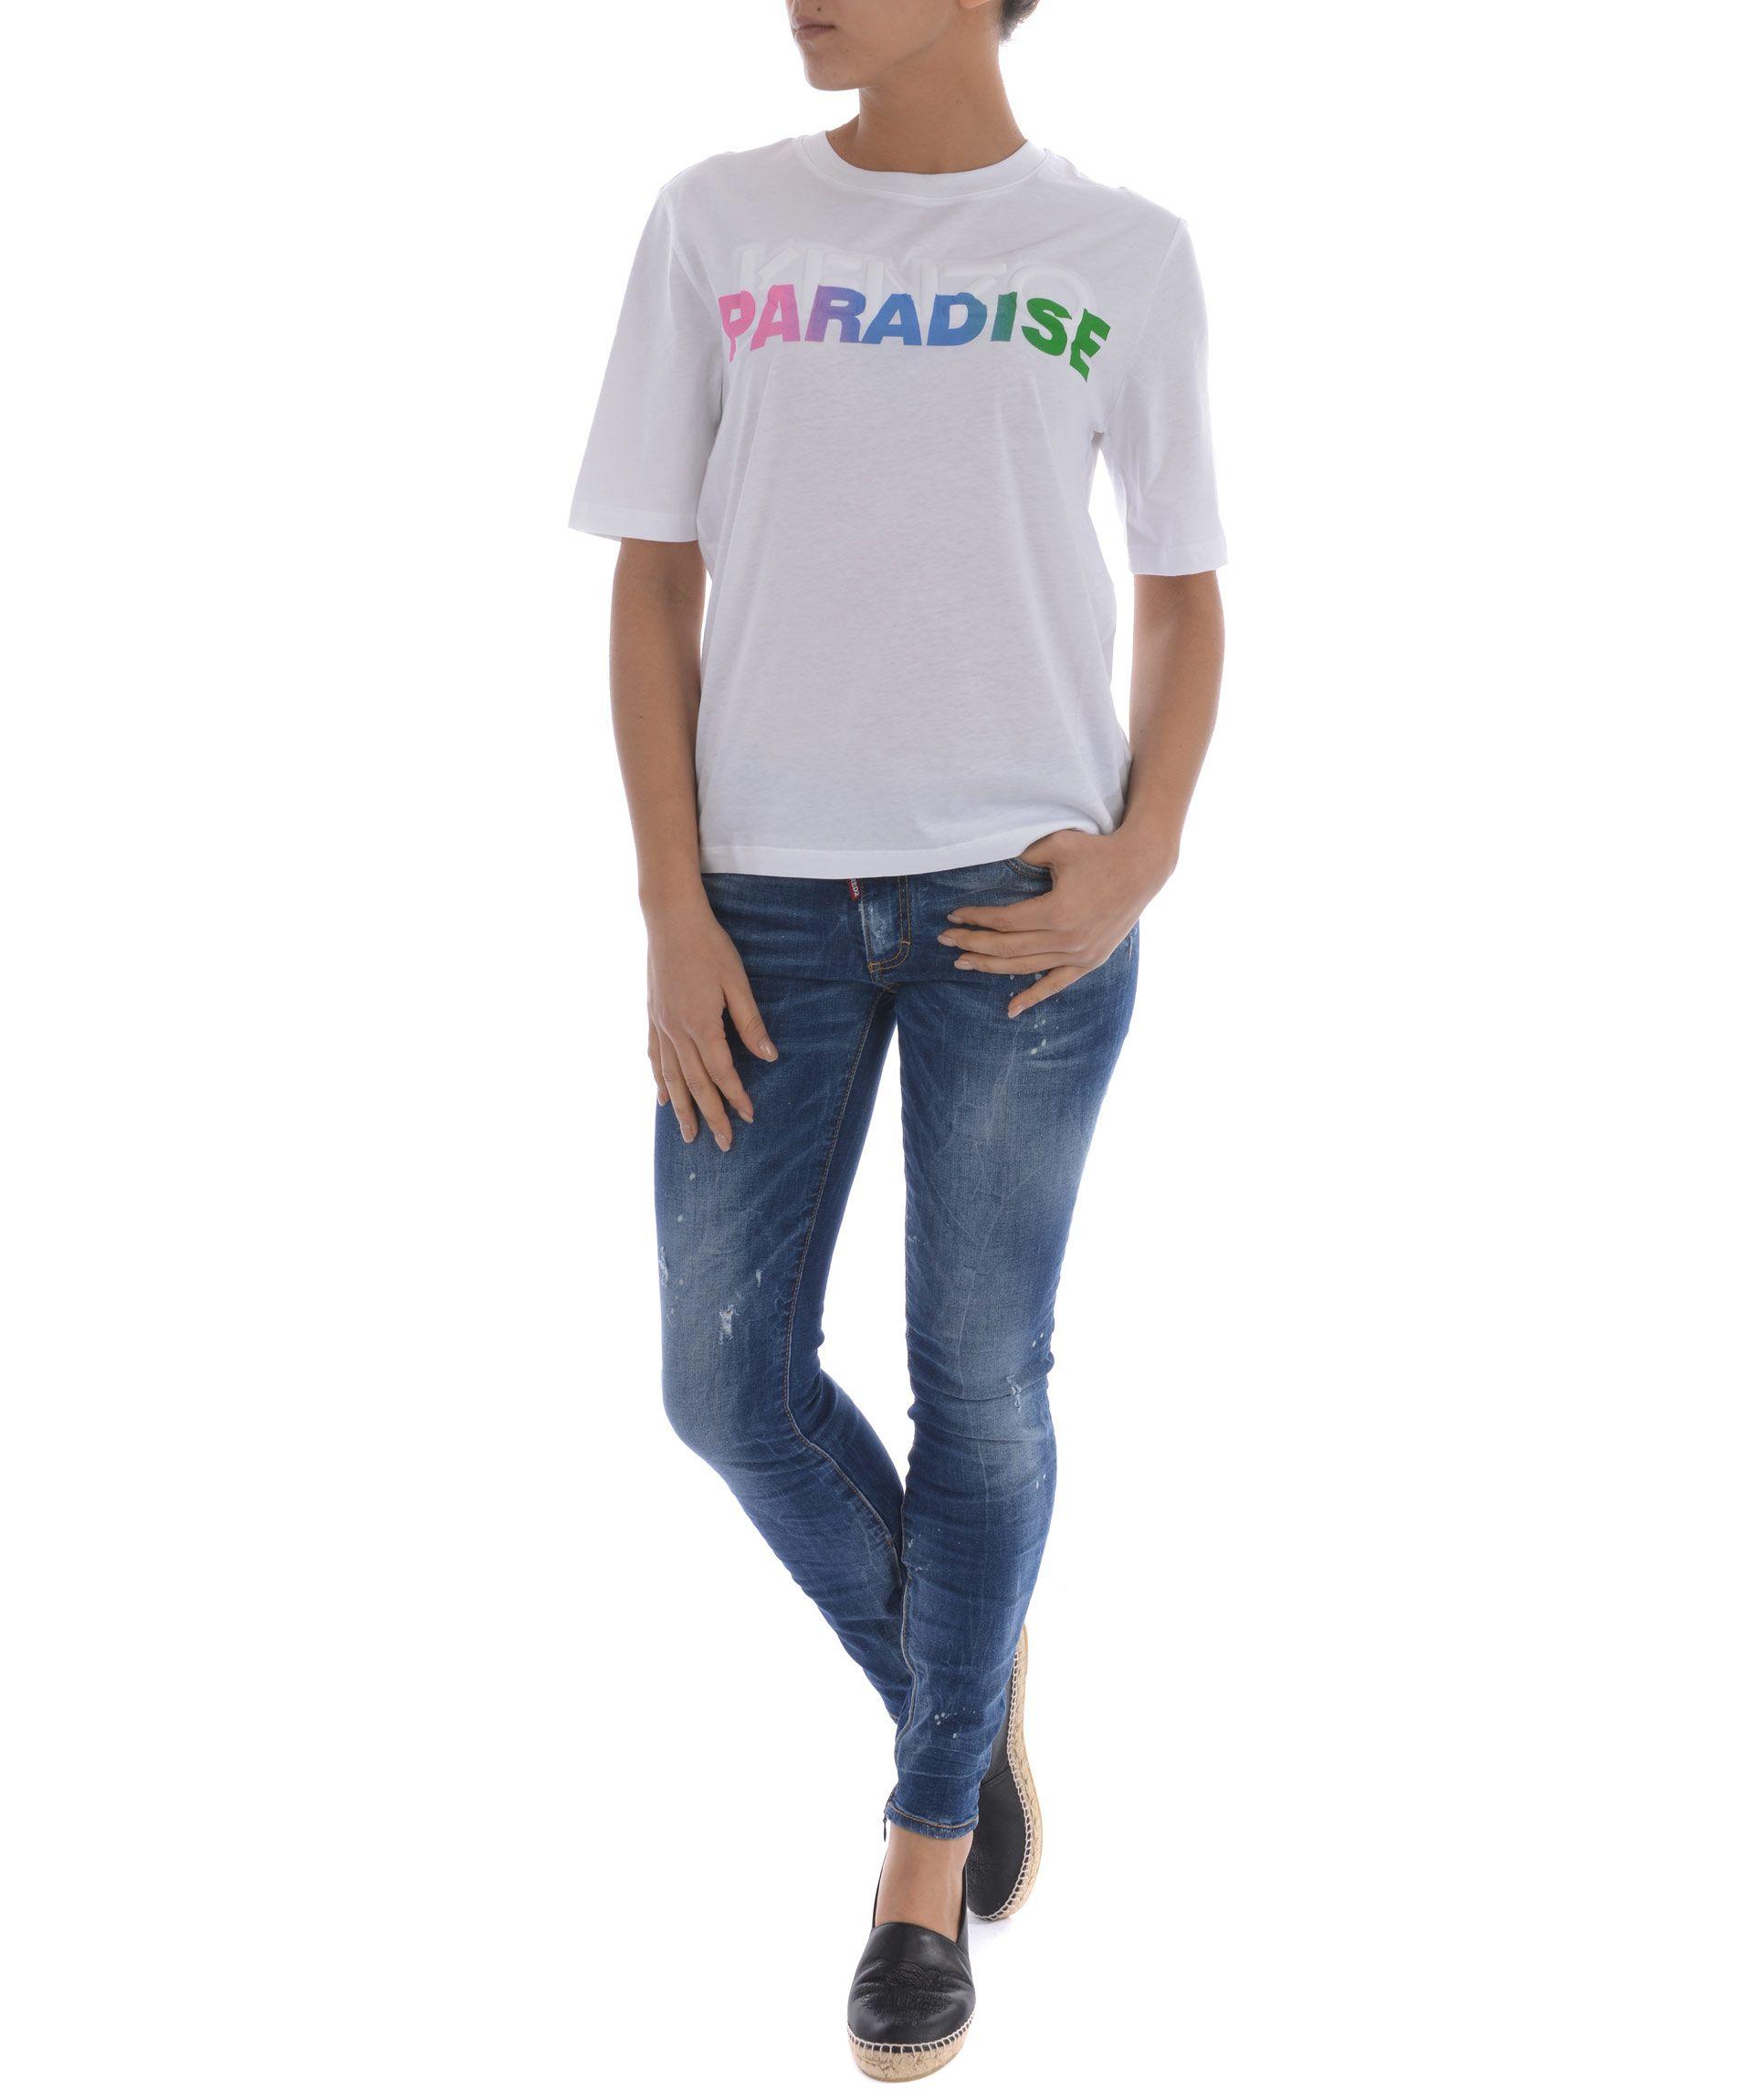 Kenzo Paradise T-shirt